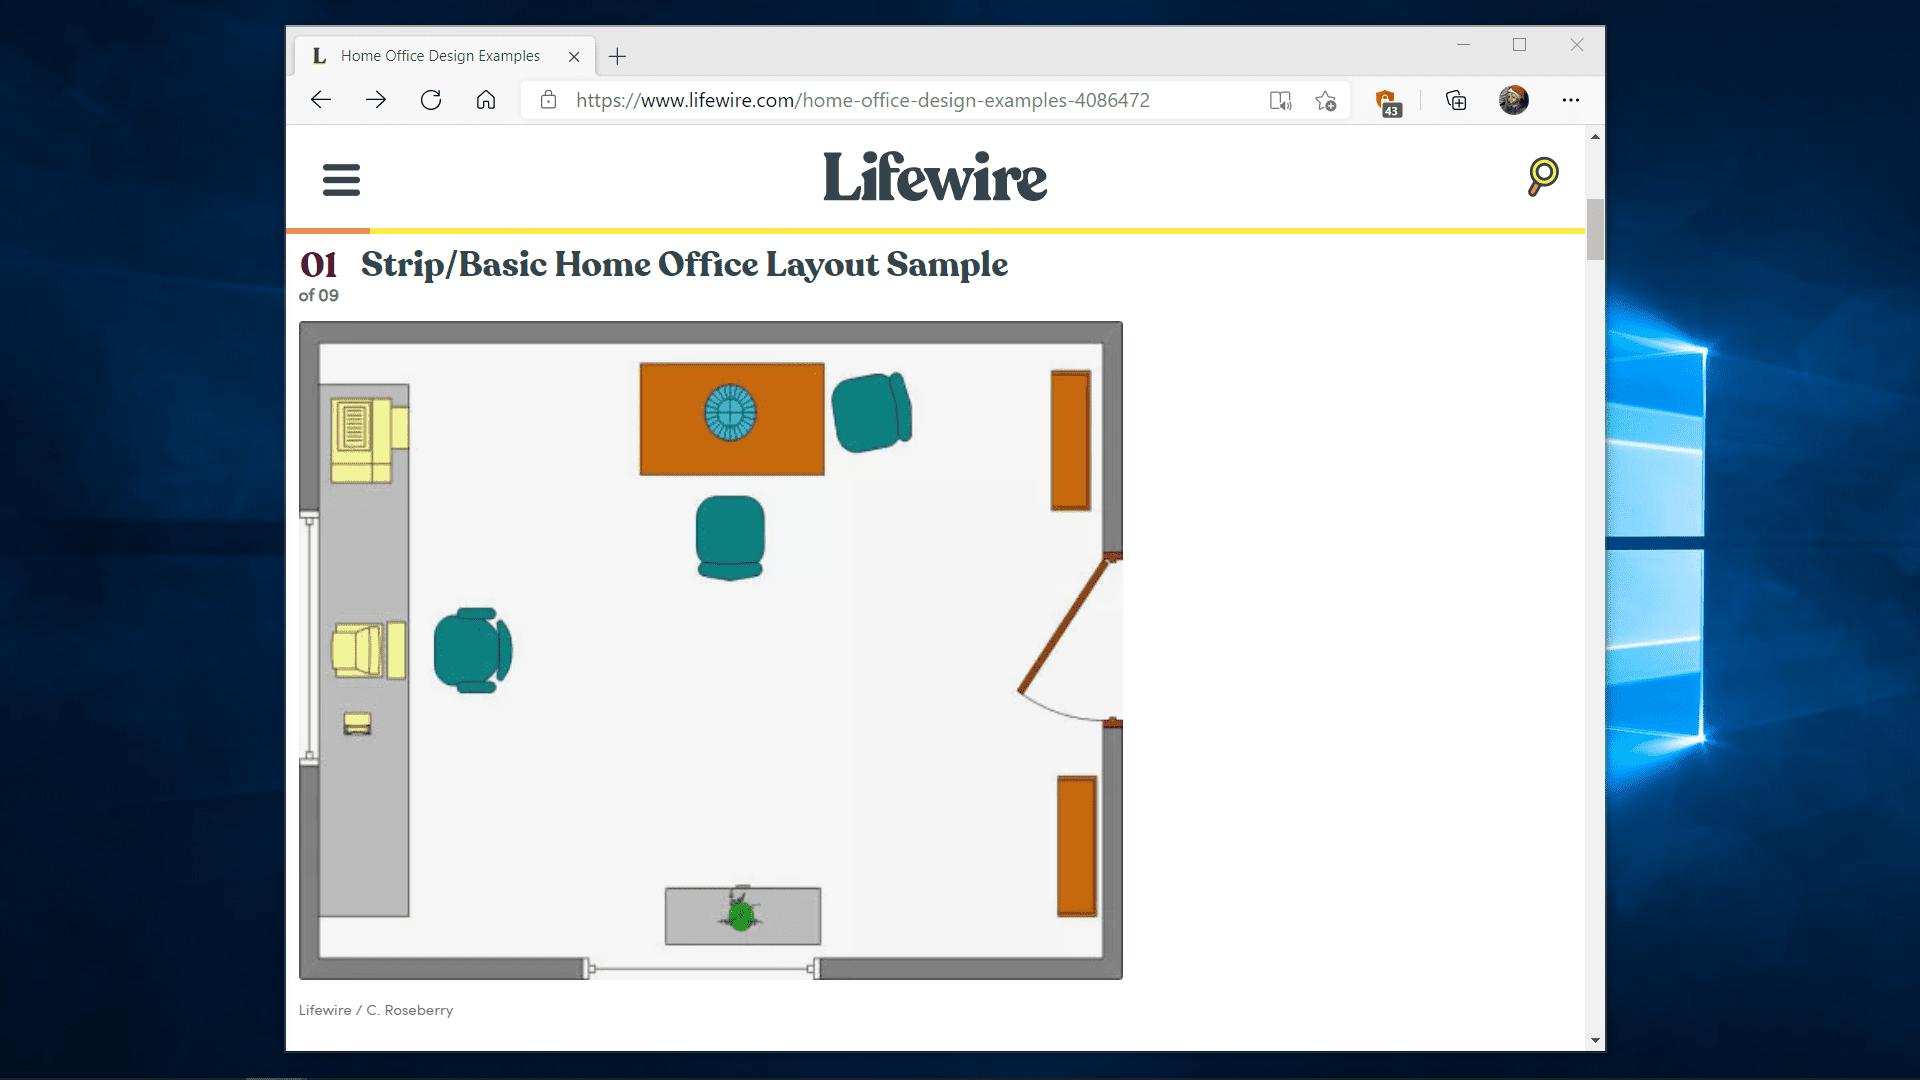 A resized Microsoft Edge window.